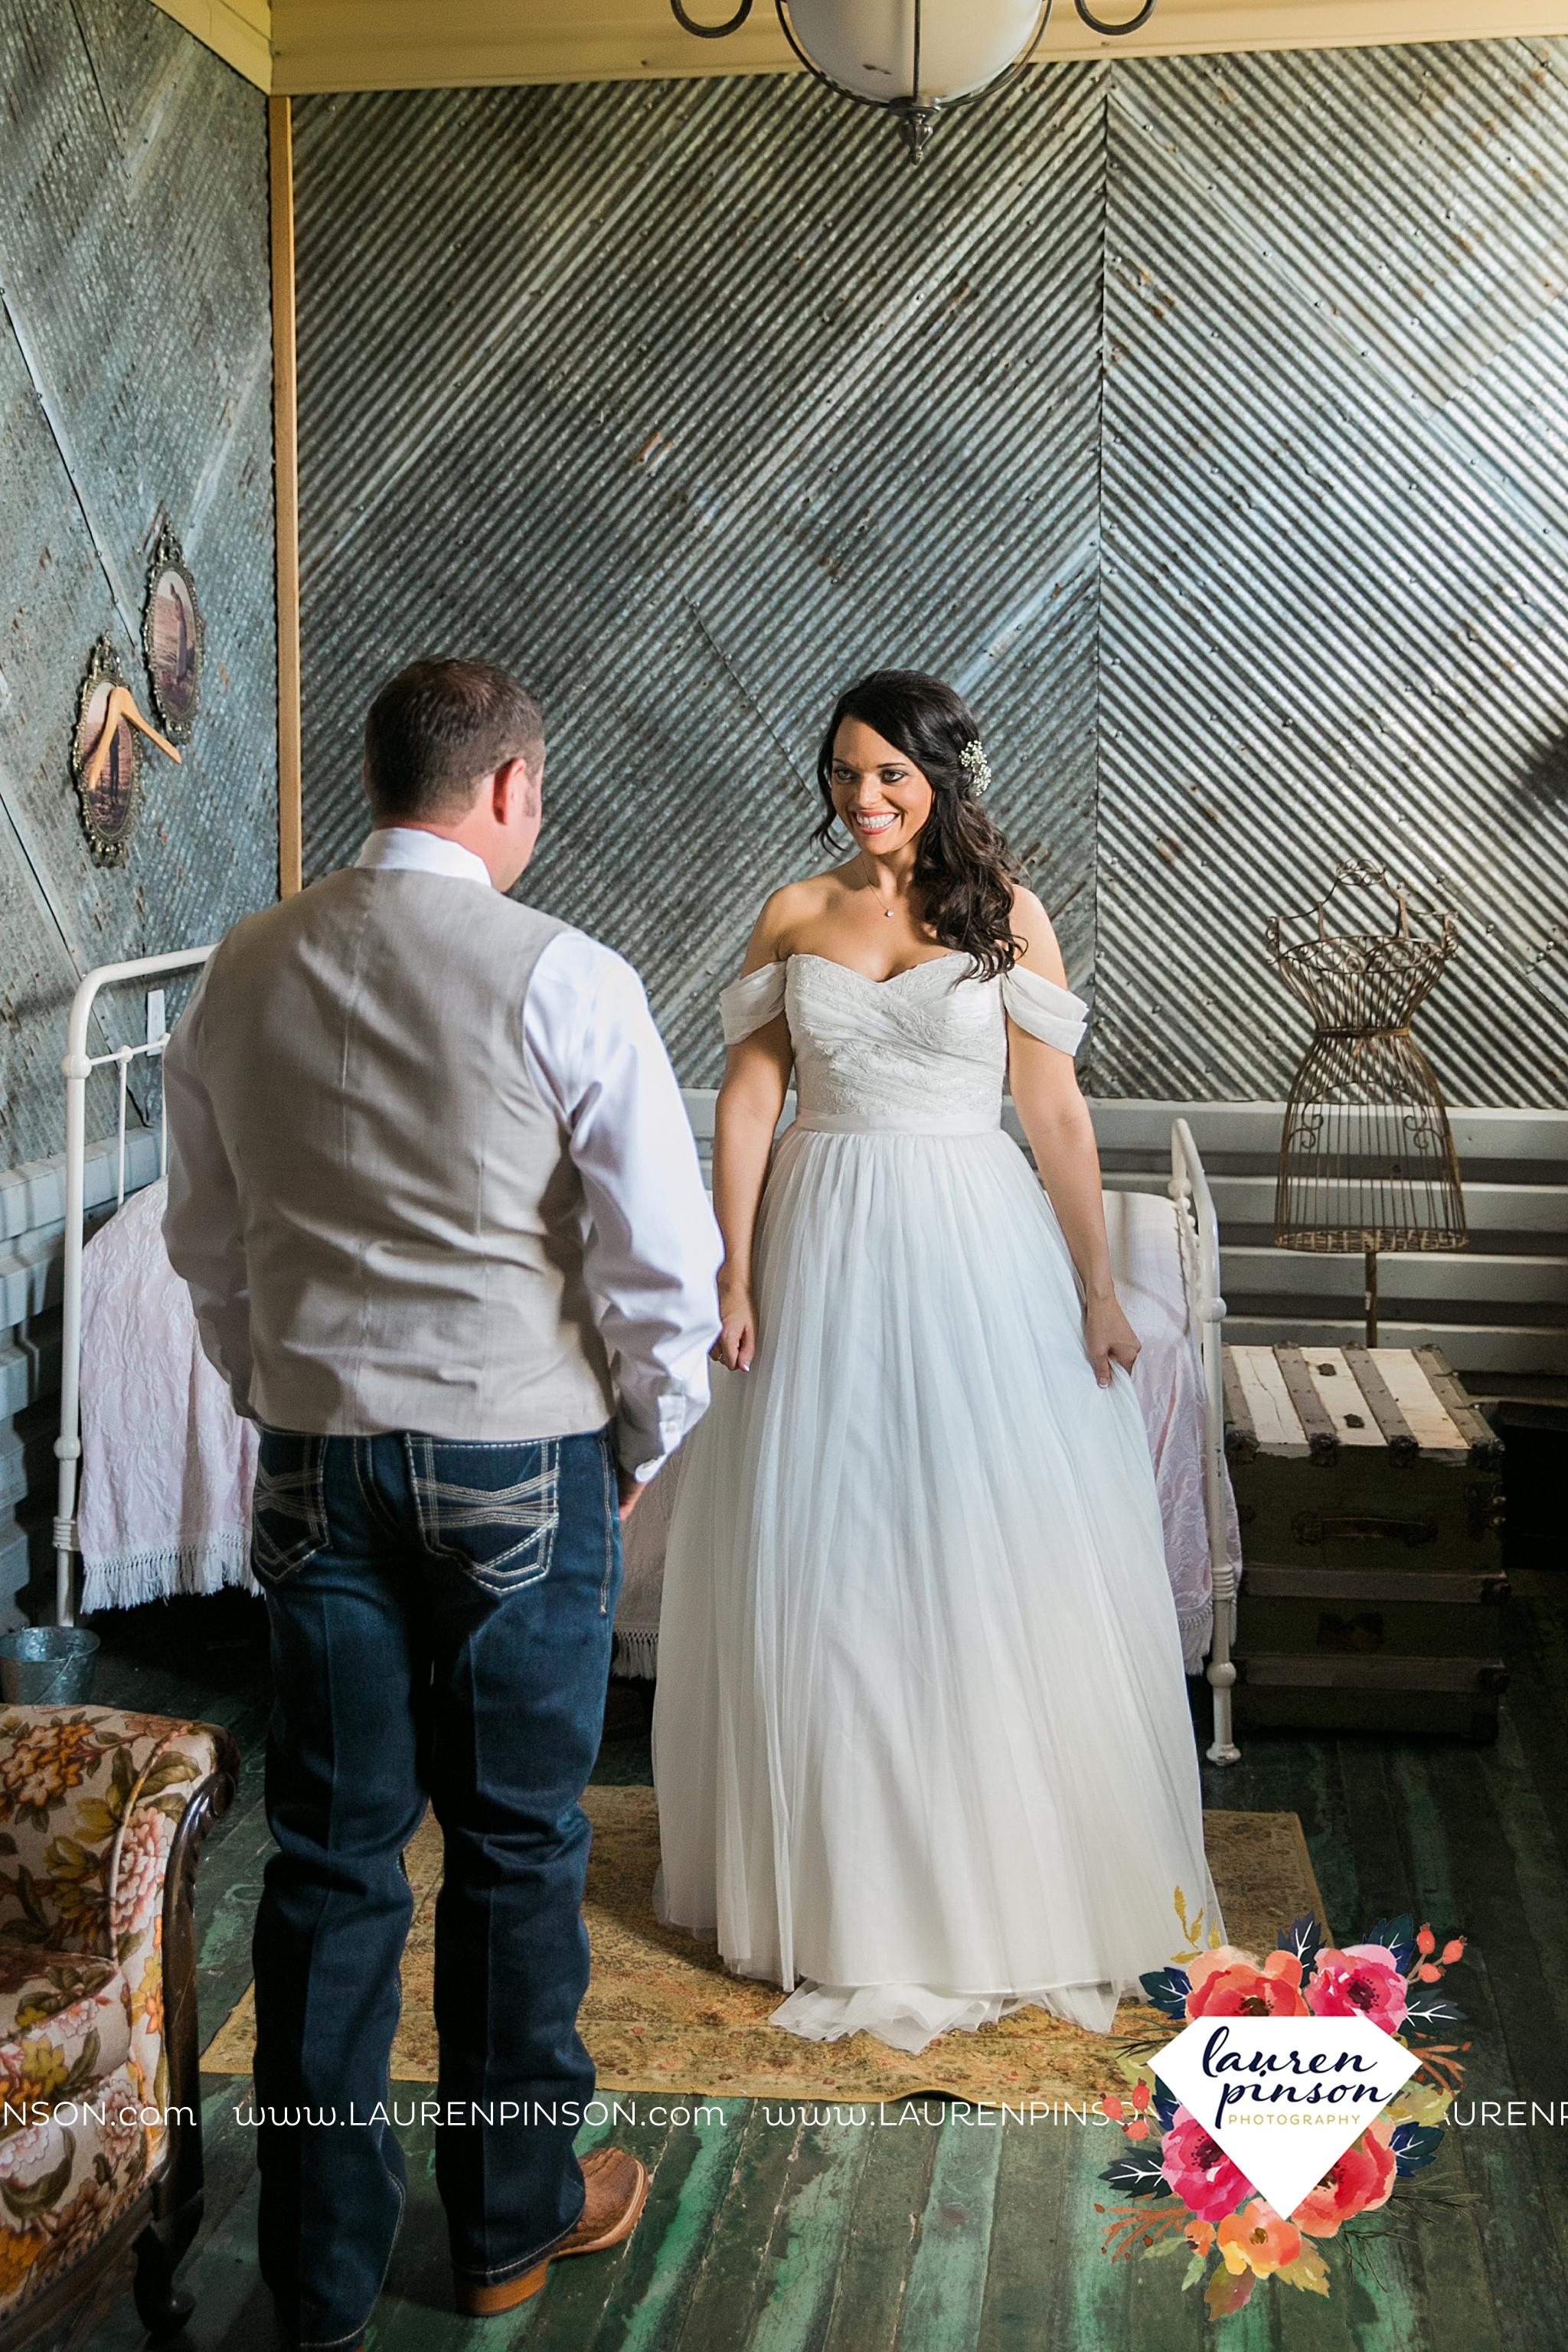 jones-barn-willow-creek-ranch-wedding-in-cleburne-texas-fort-worth-dfw-wichita-falls-wedding-photography_3202.jpg